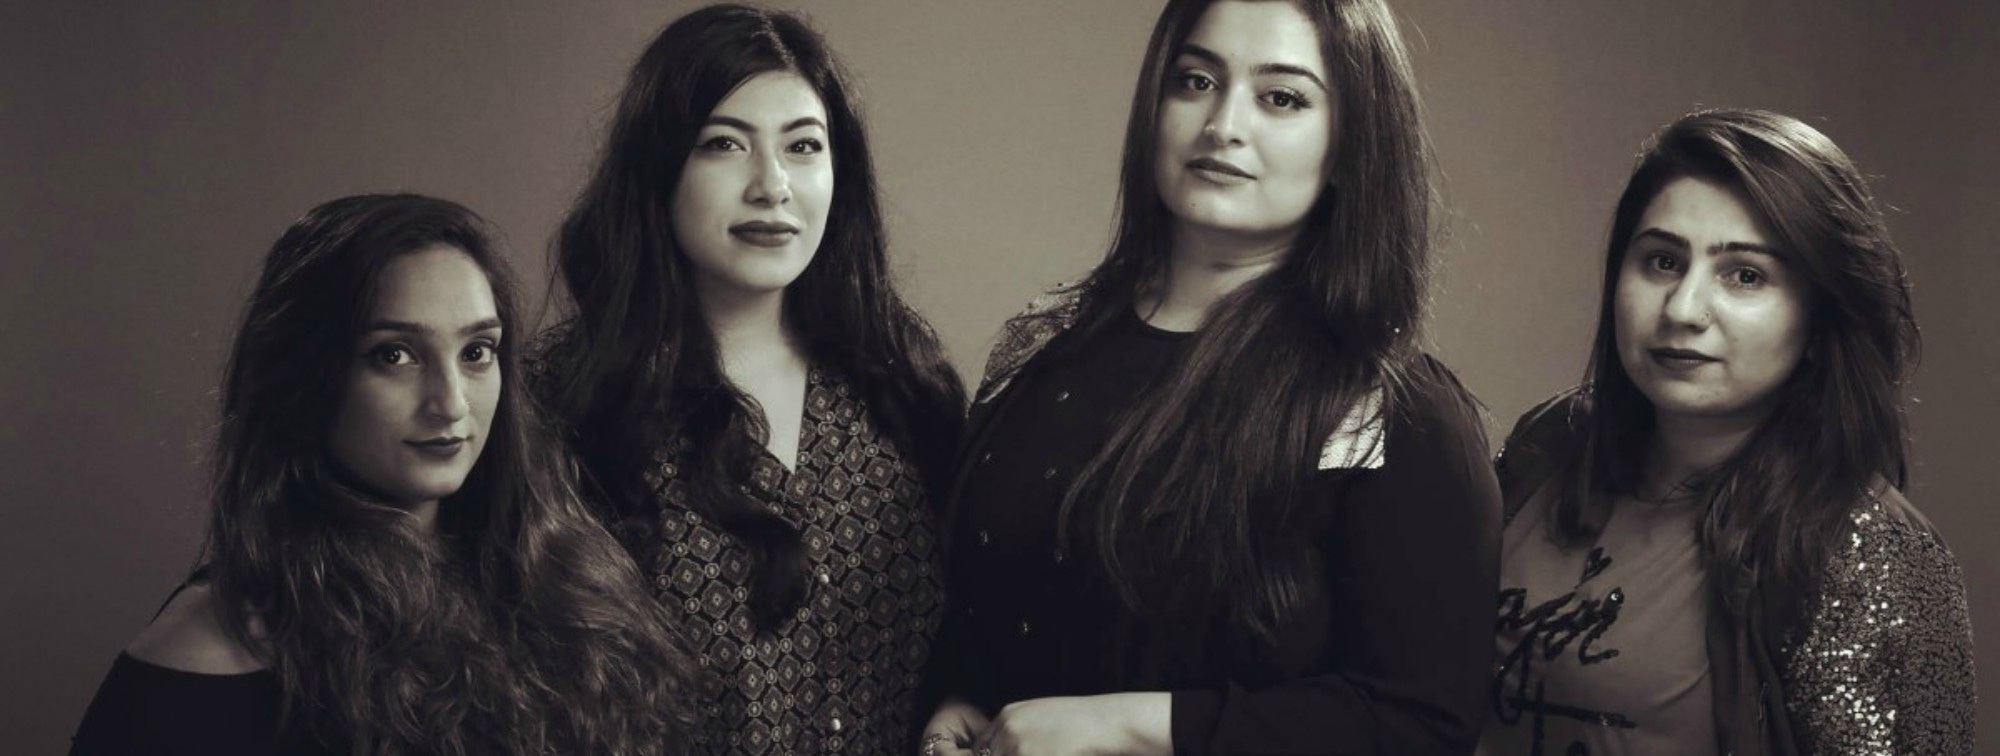 3e52361a9 The plus-size Pakistani woman exists